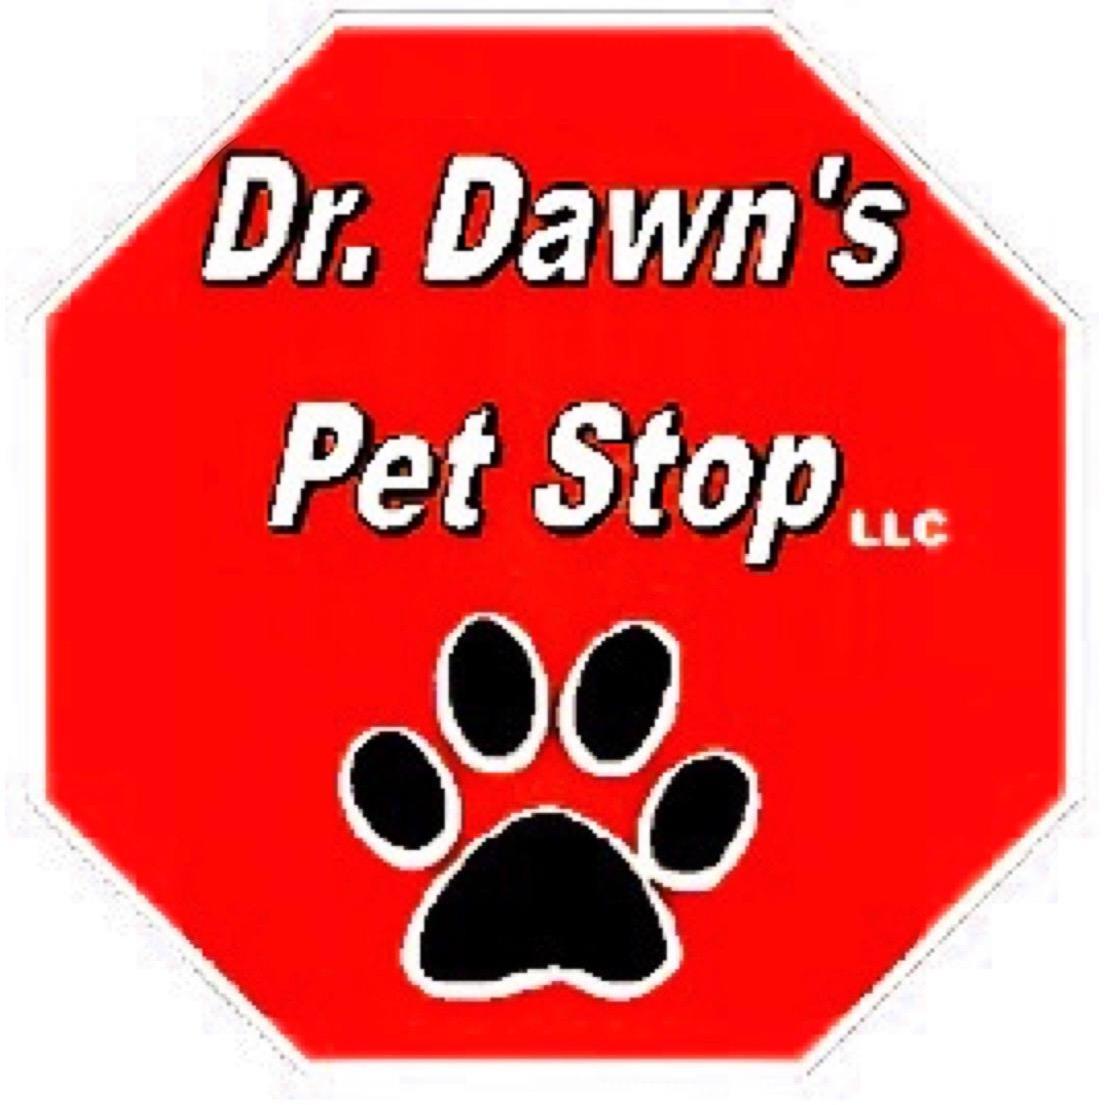 Dr. Dawn's Pet Stop LLC